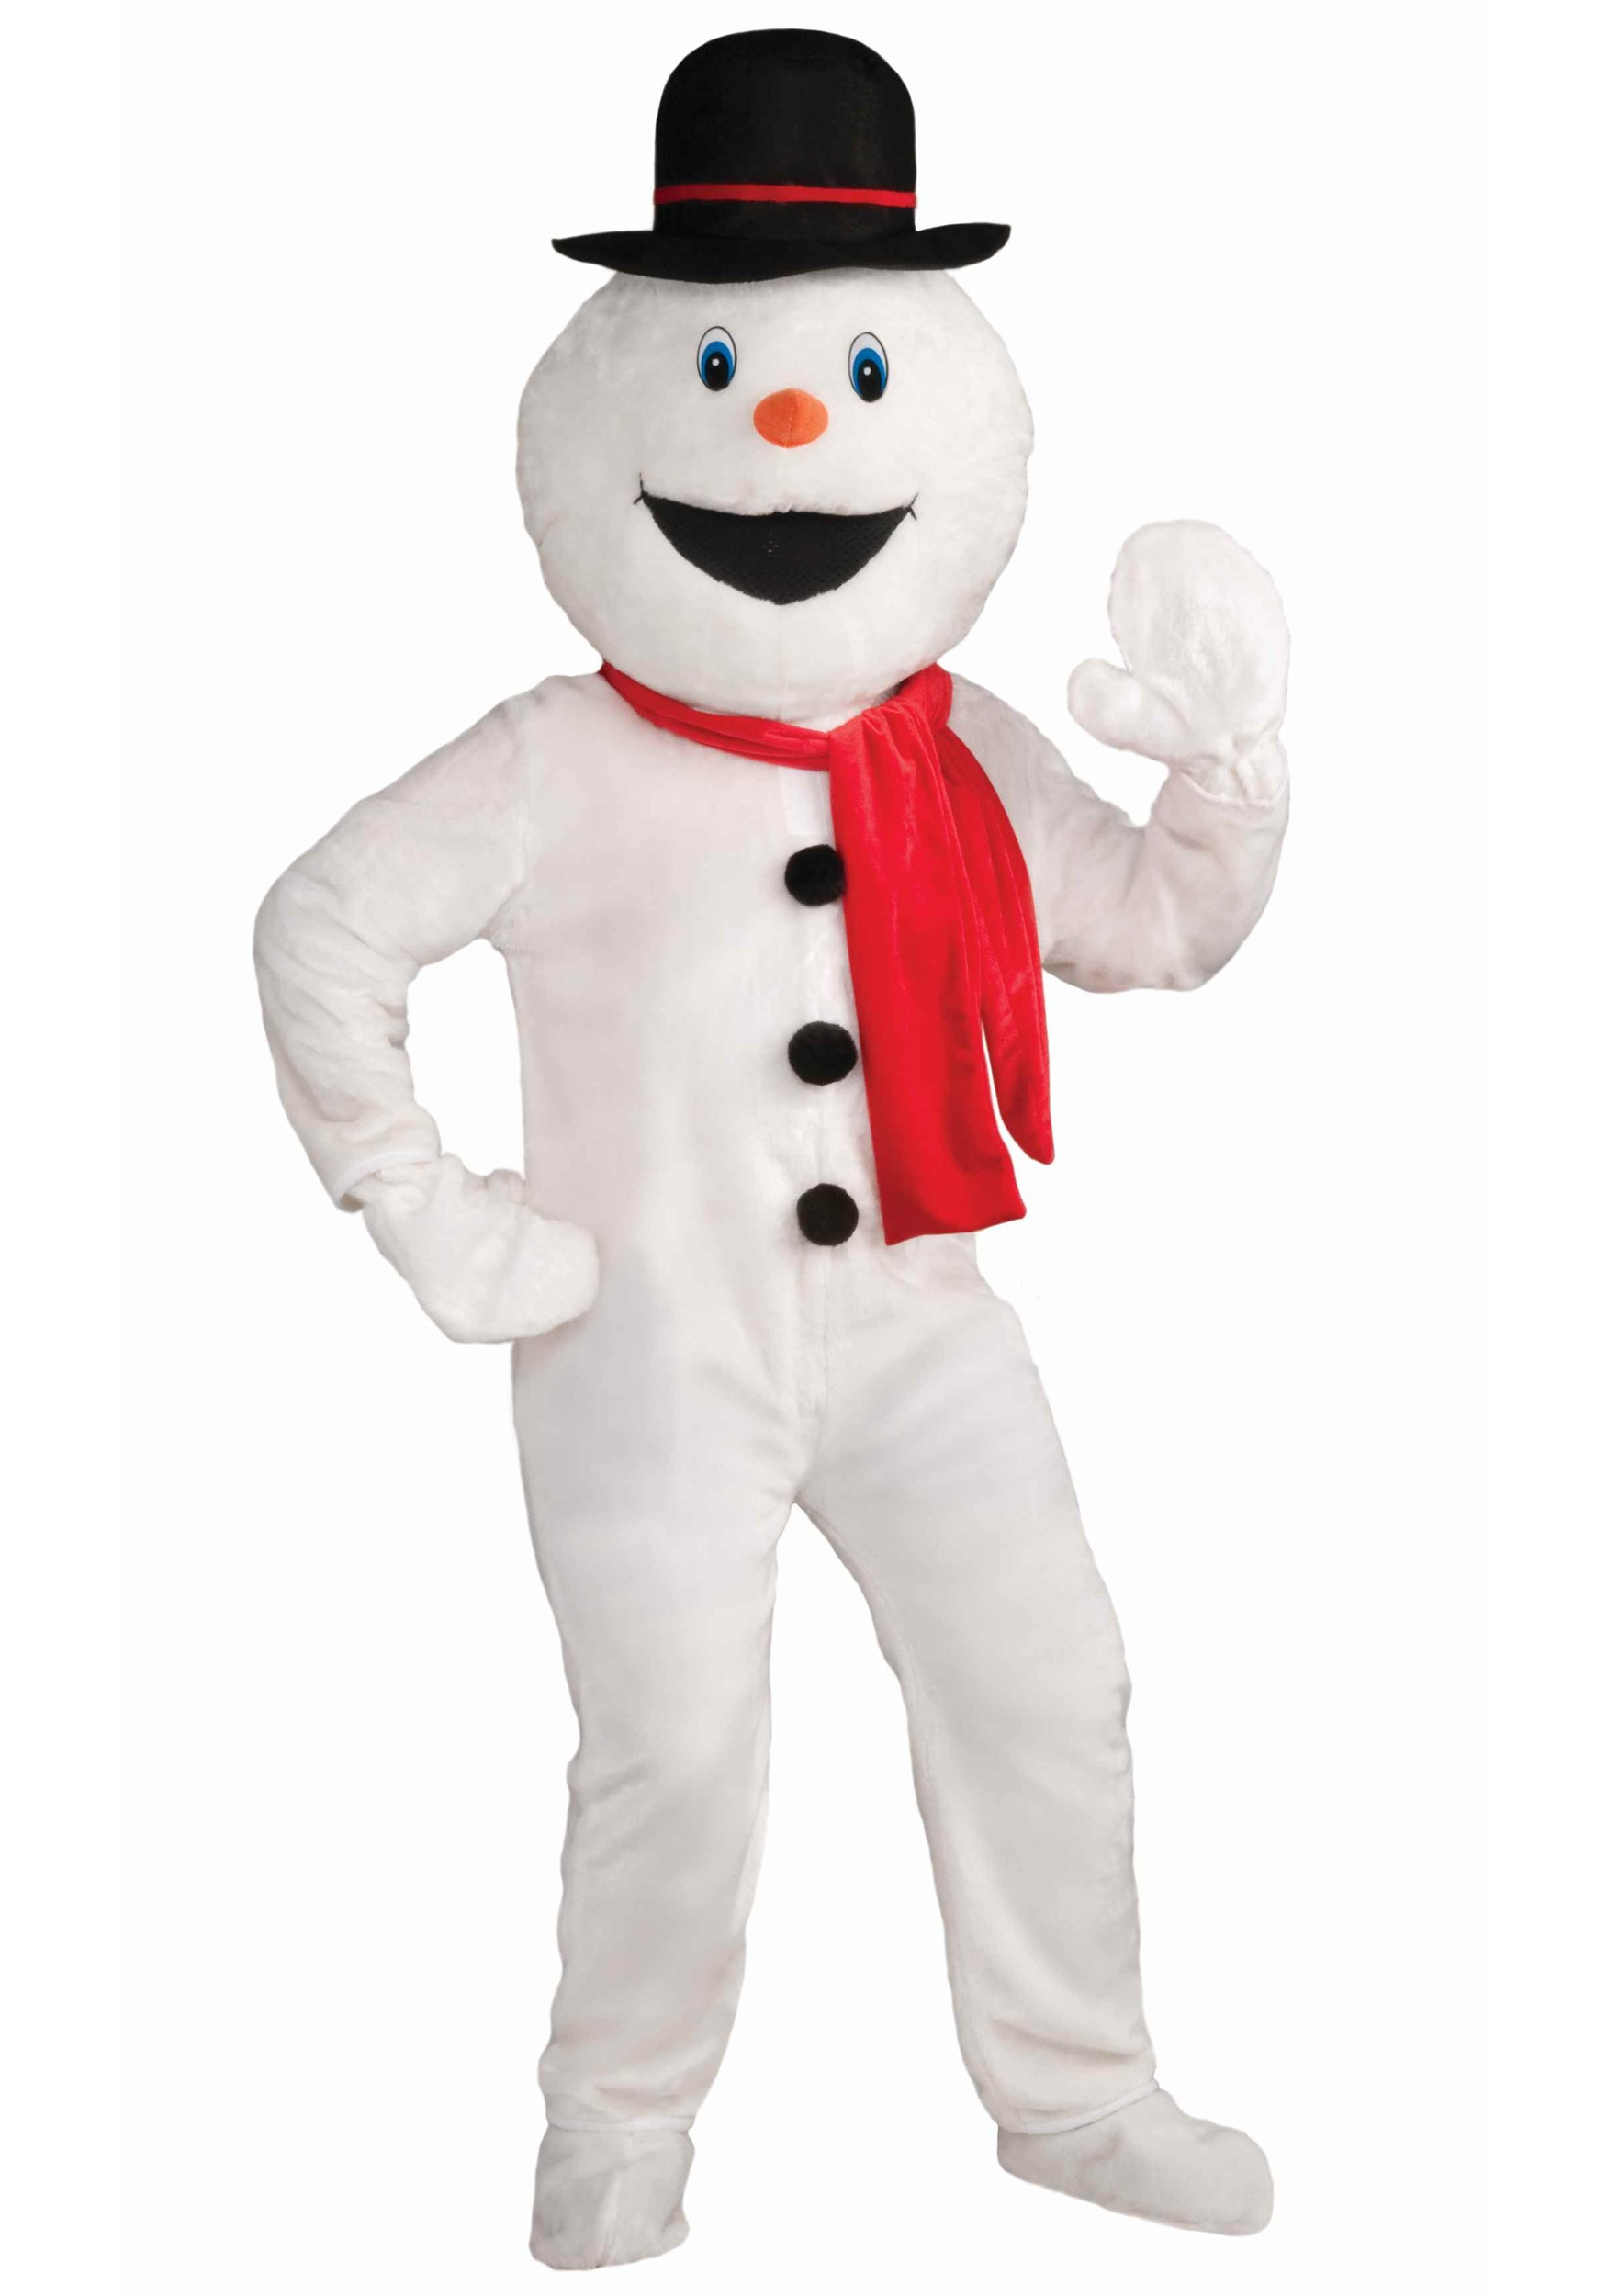 d66c0985f9947 mascot-snowman-costume.jpg